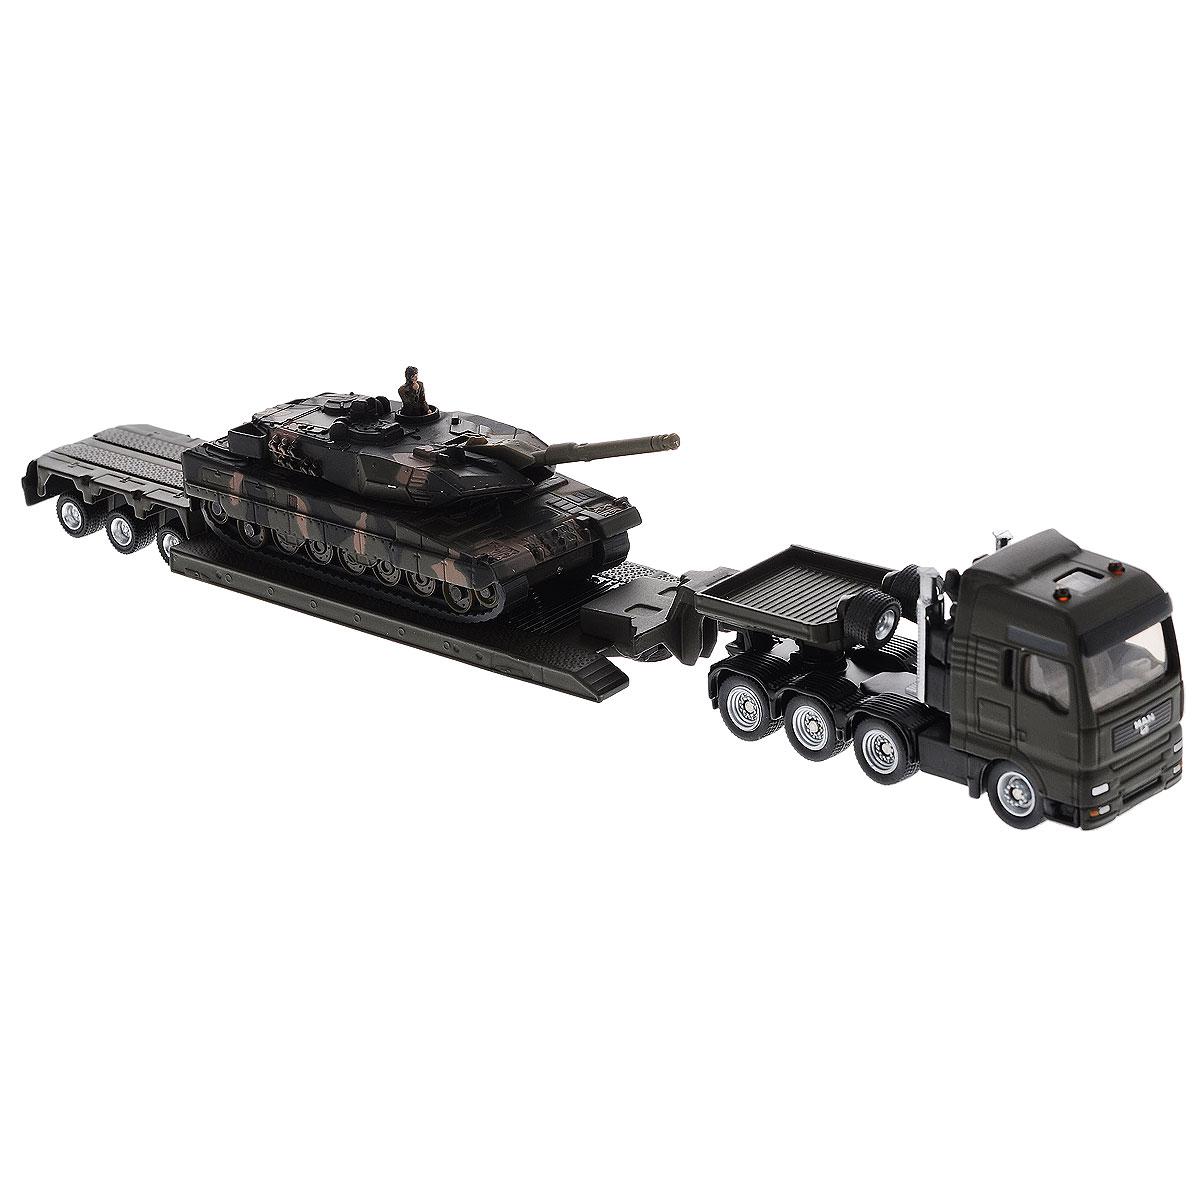 Siku Тягач MAN с танком на платформе siku siku 1614 тягач с низкорамной платформой и ракетой 1 55